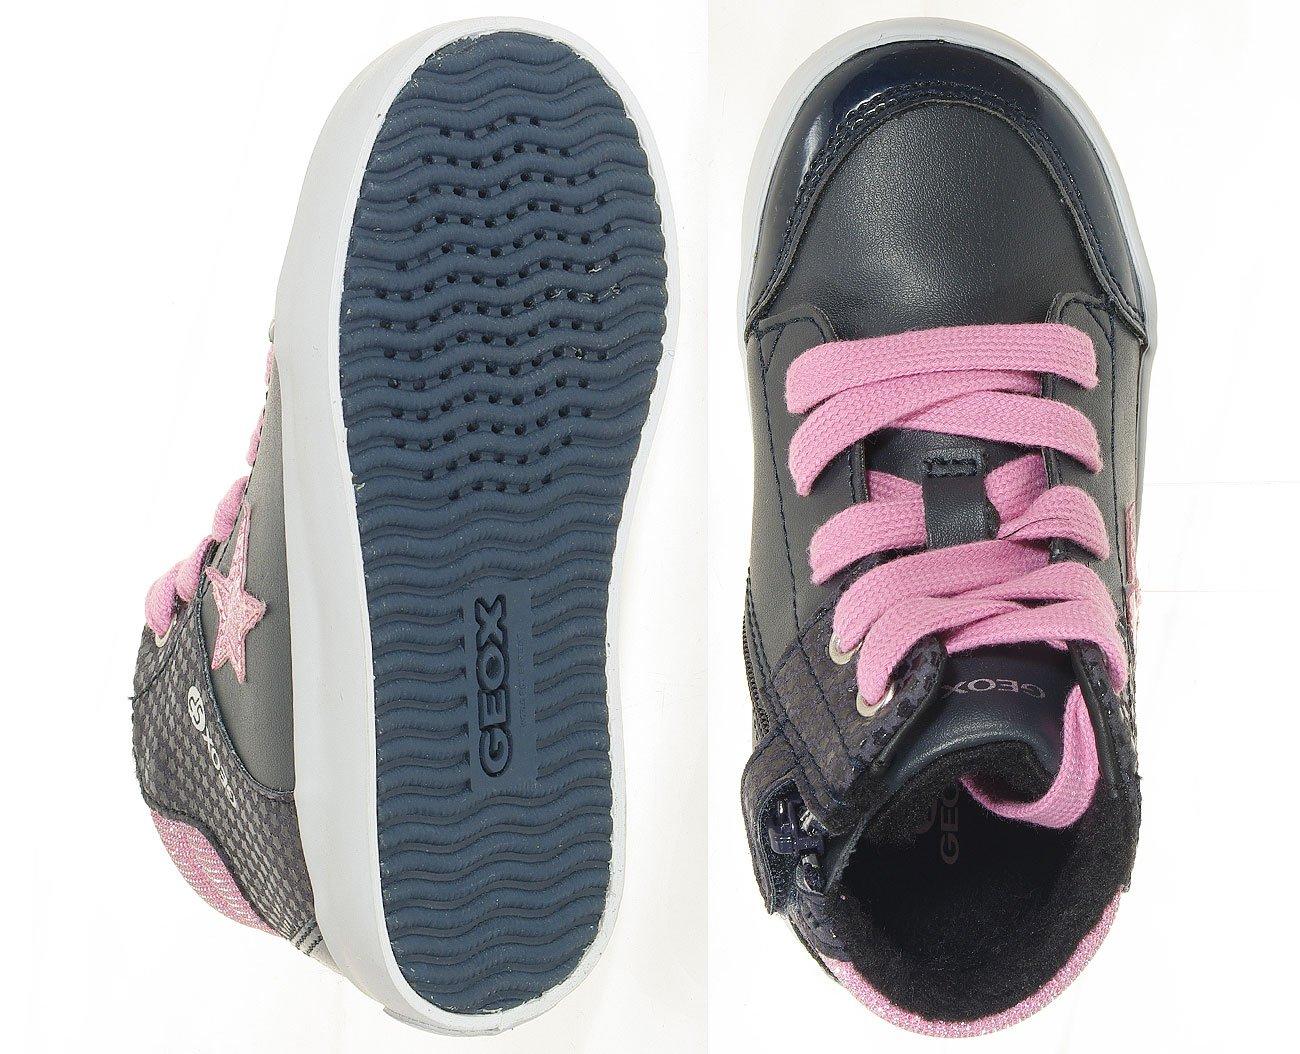 GEOX Gisli A sneakers GBK+suede navydk pink 27